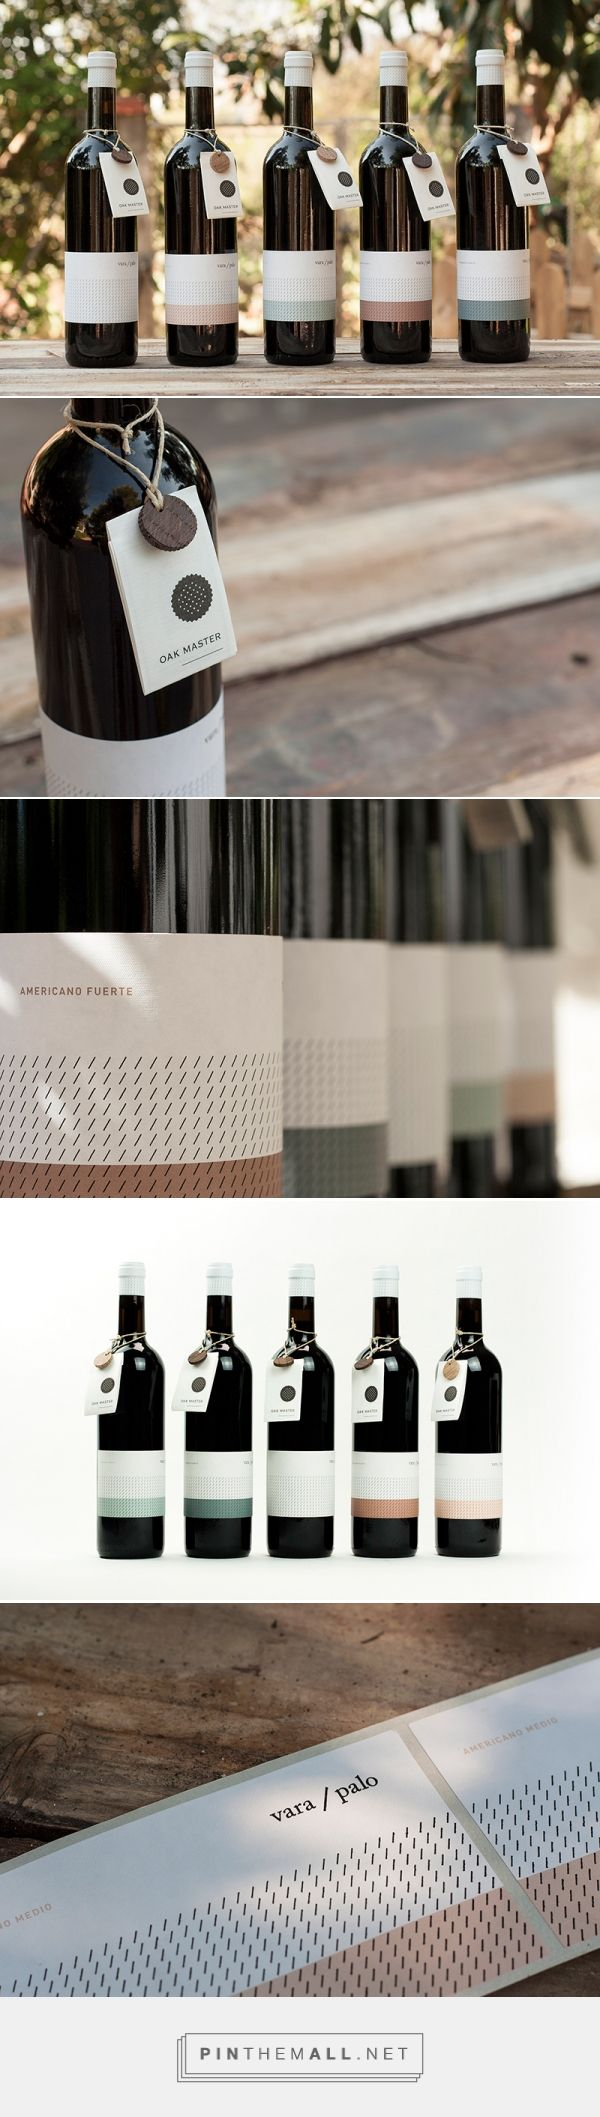 Vara / Palo  -  Packaging of the World - Creative Package Design Gallery - http://www.packagingoftheworld.com/2016/04/vara-palo.html